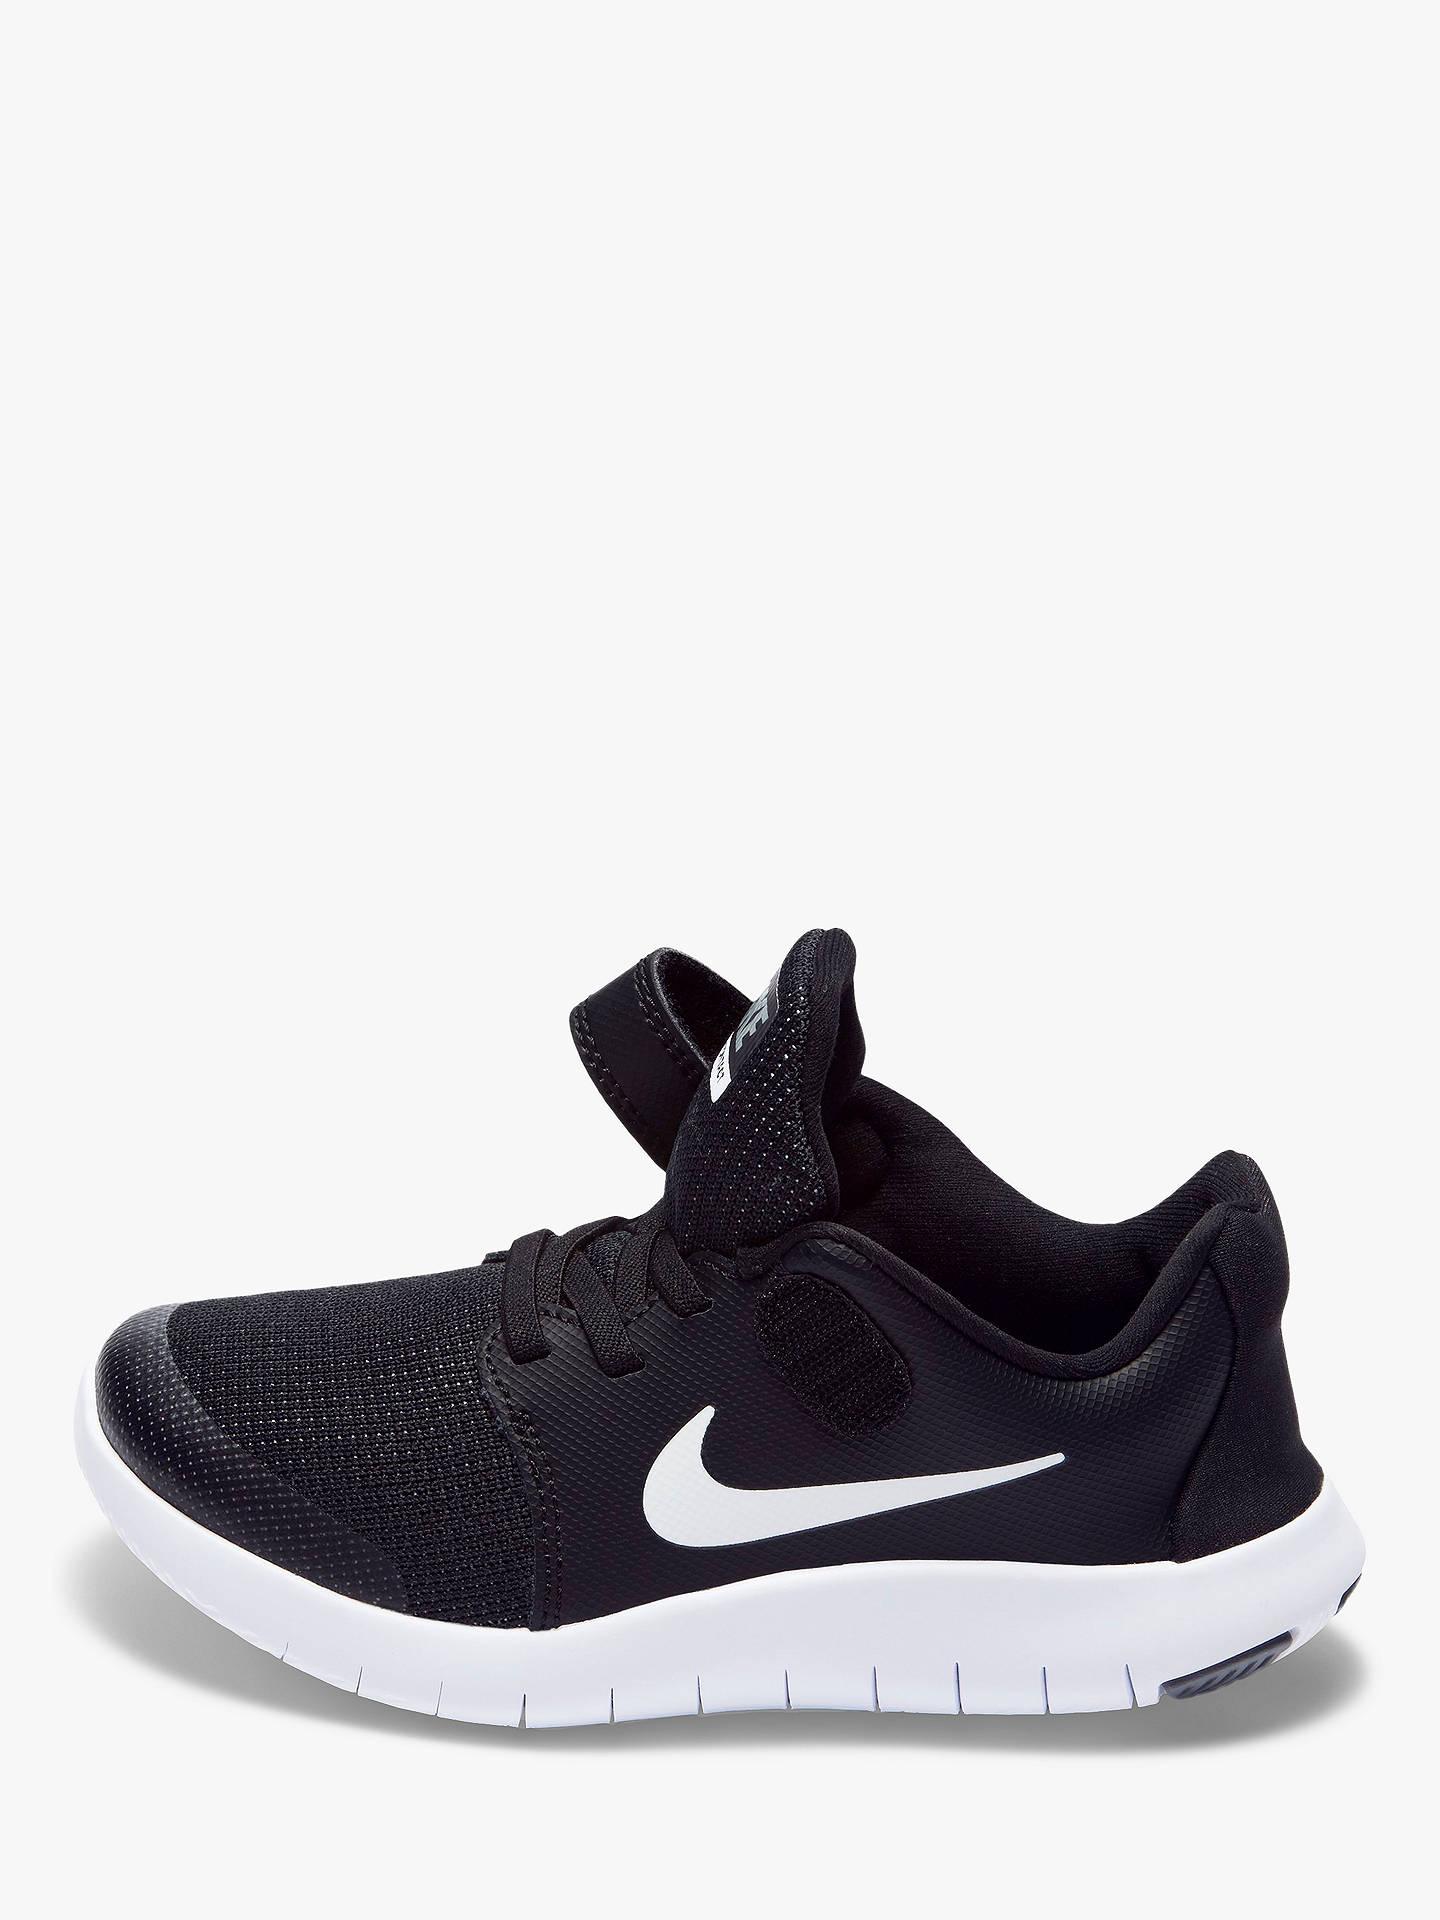 sacudir Necesito carrete  Nike Children's Flex Contact 2 Trainers, Black at John Lewis & Partners